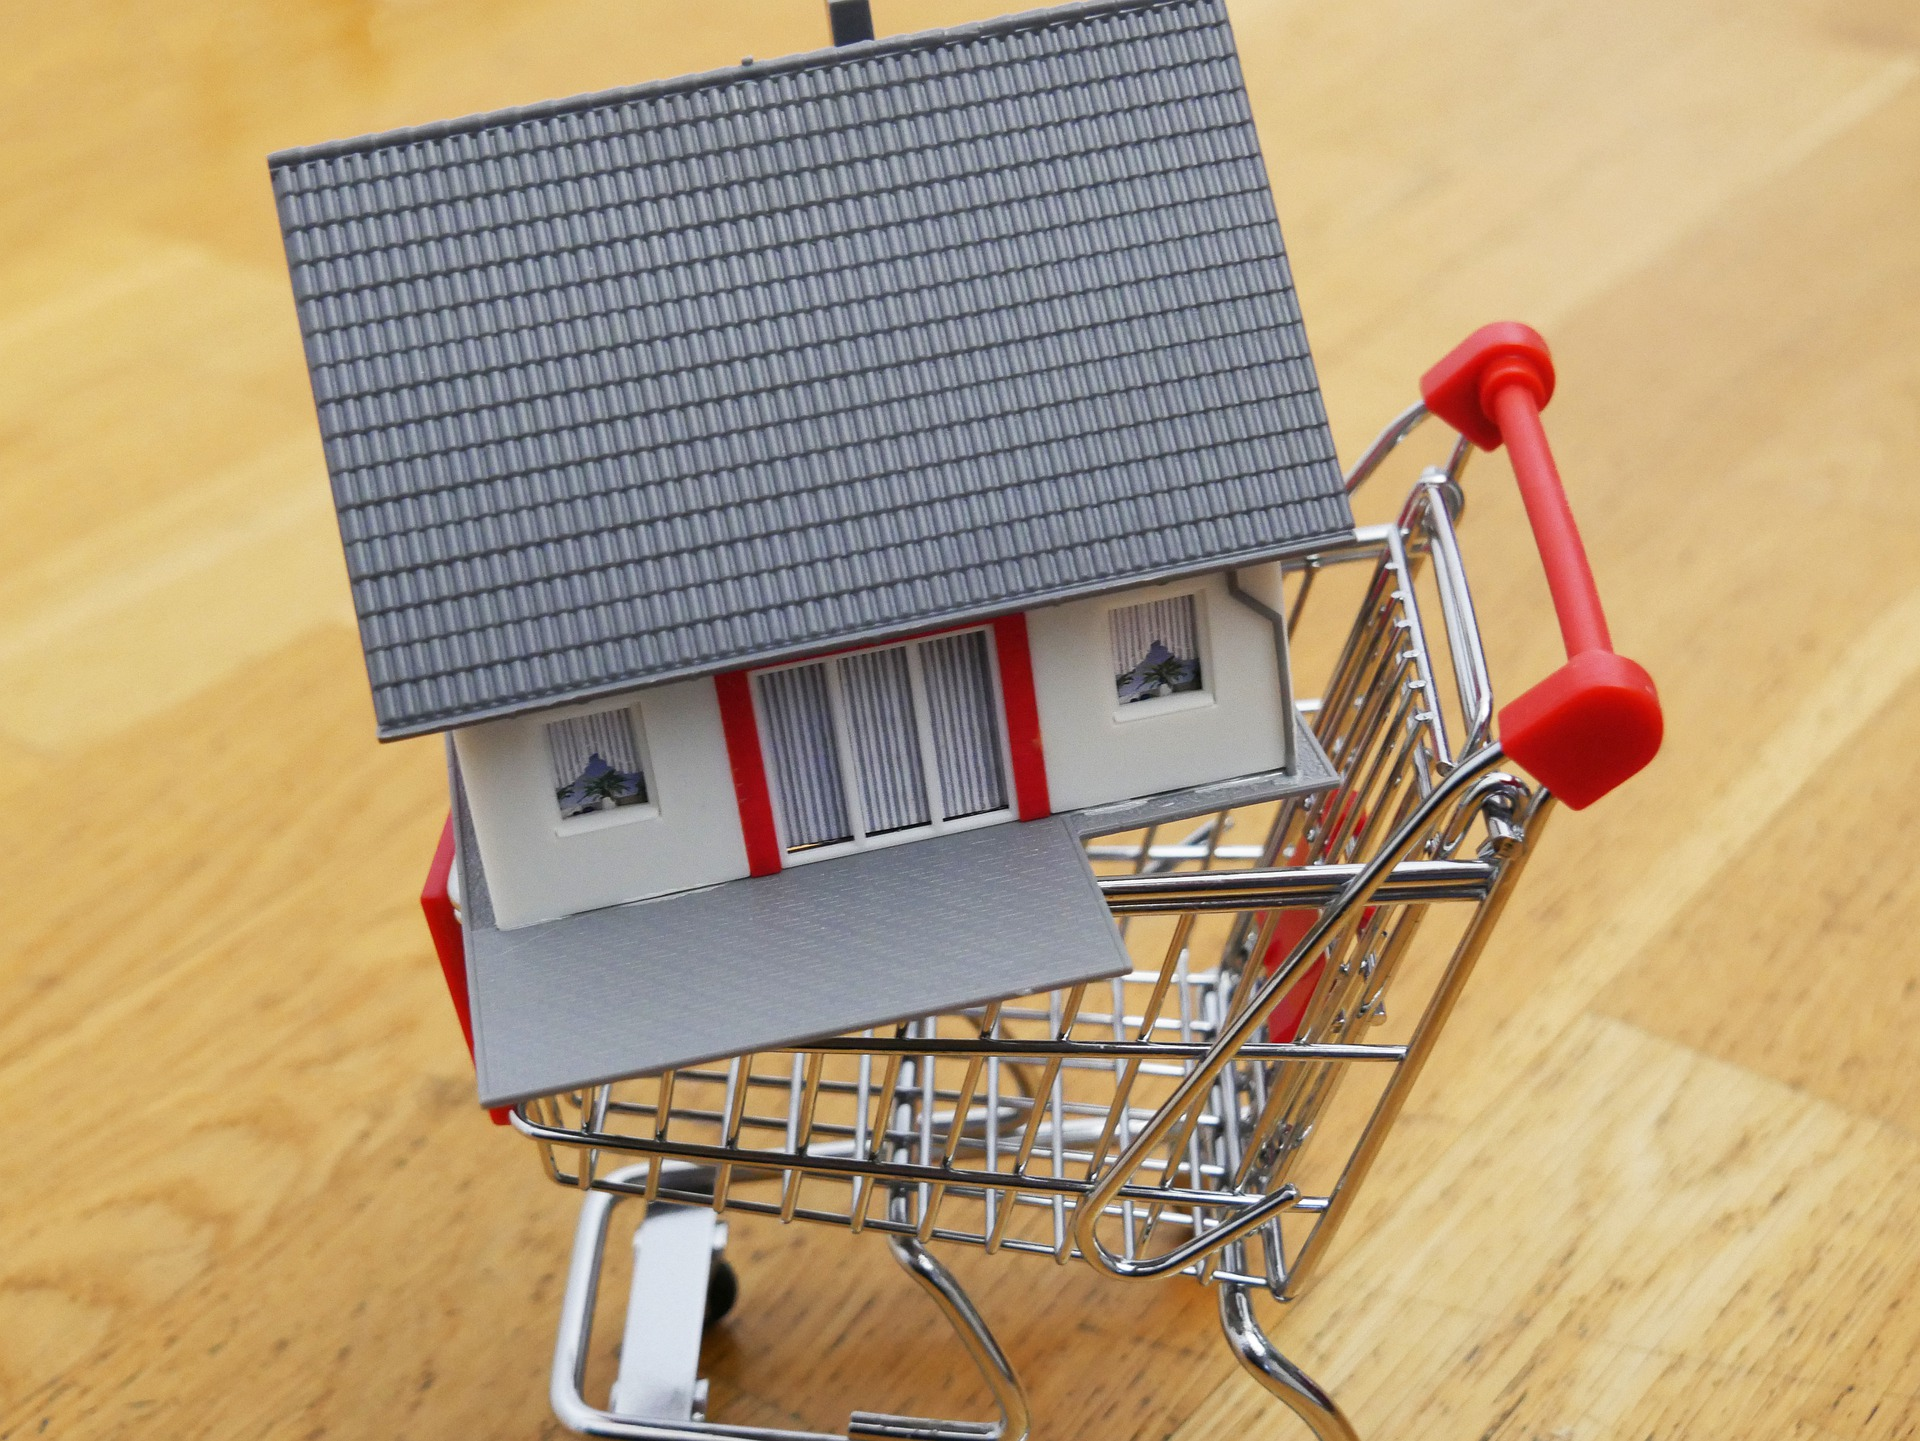 Strategi Cicilan Rumah untuk Permudah Pelunasan Rumah